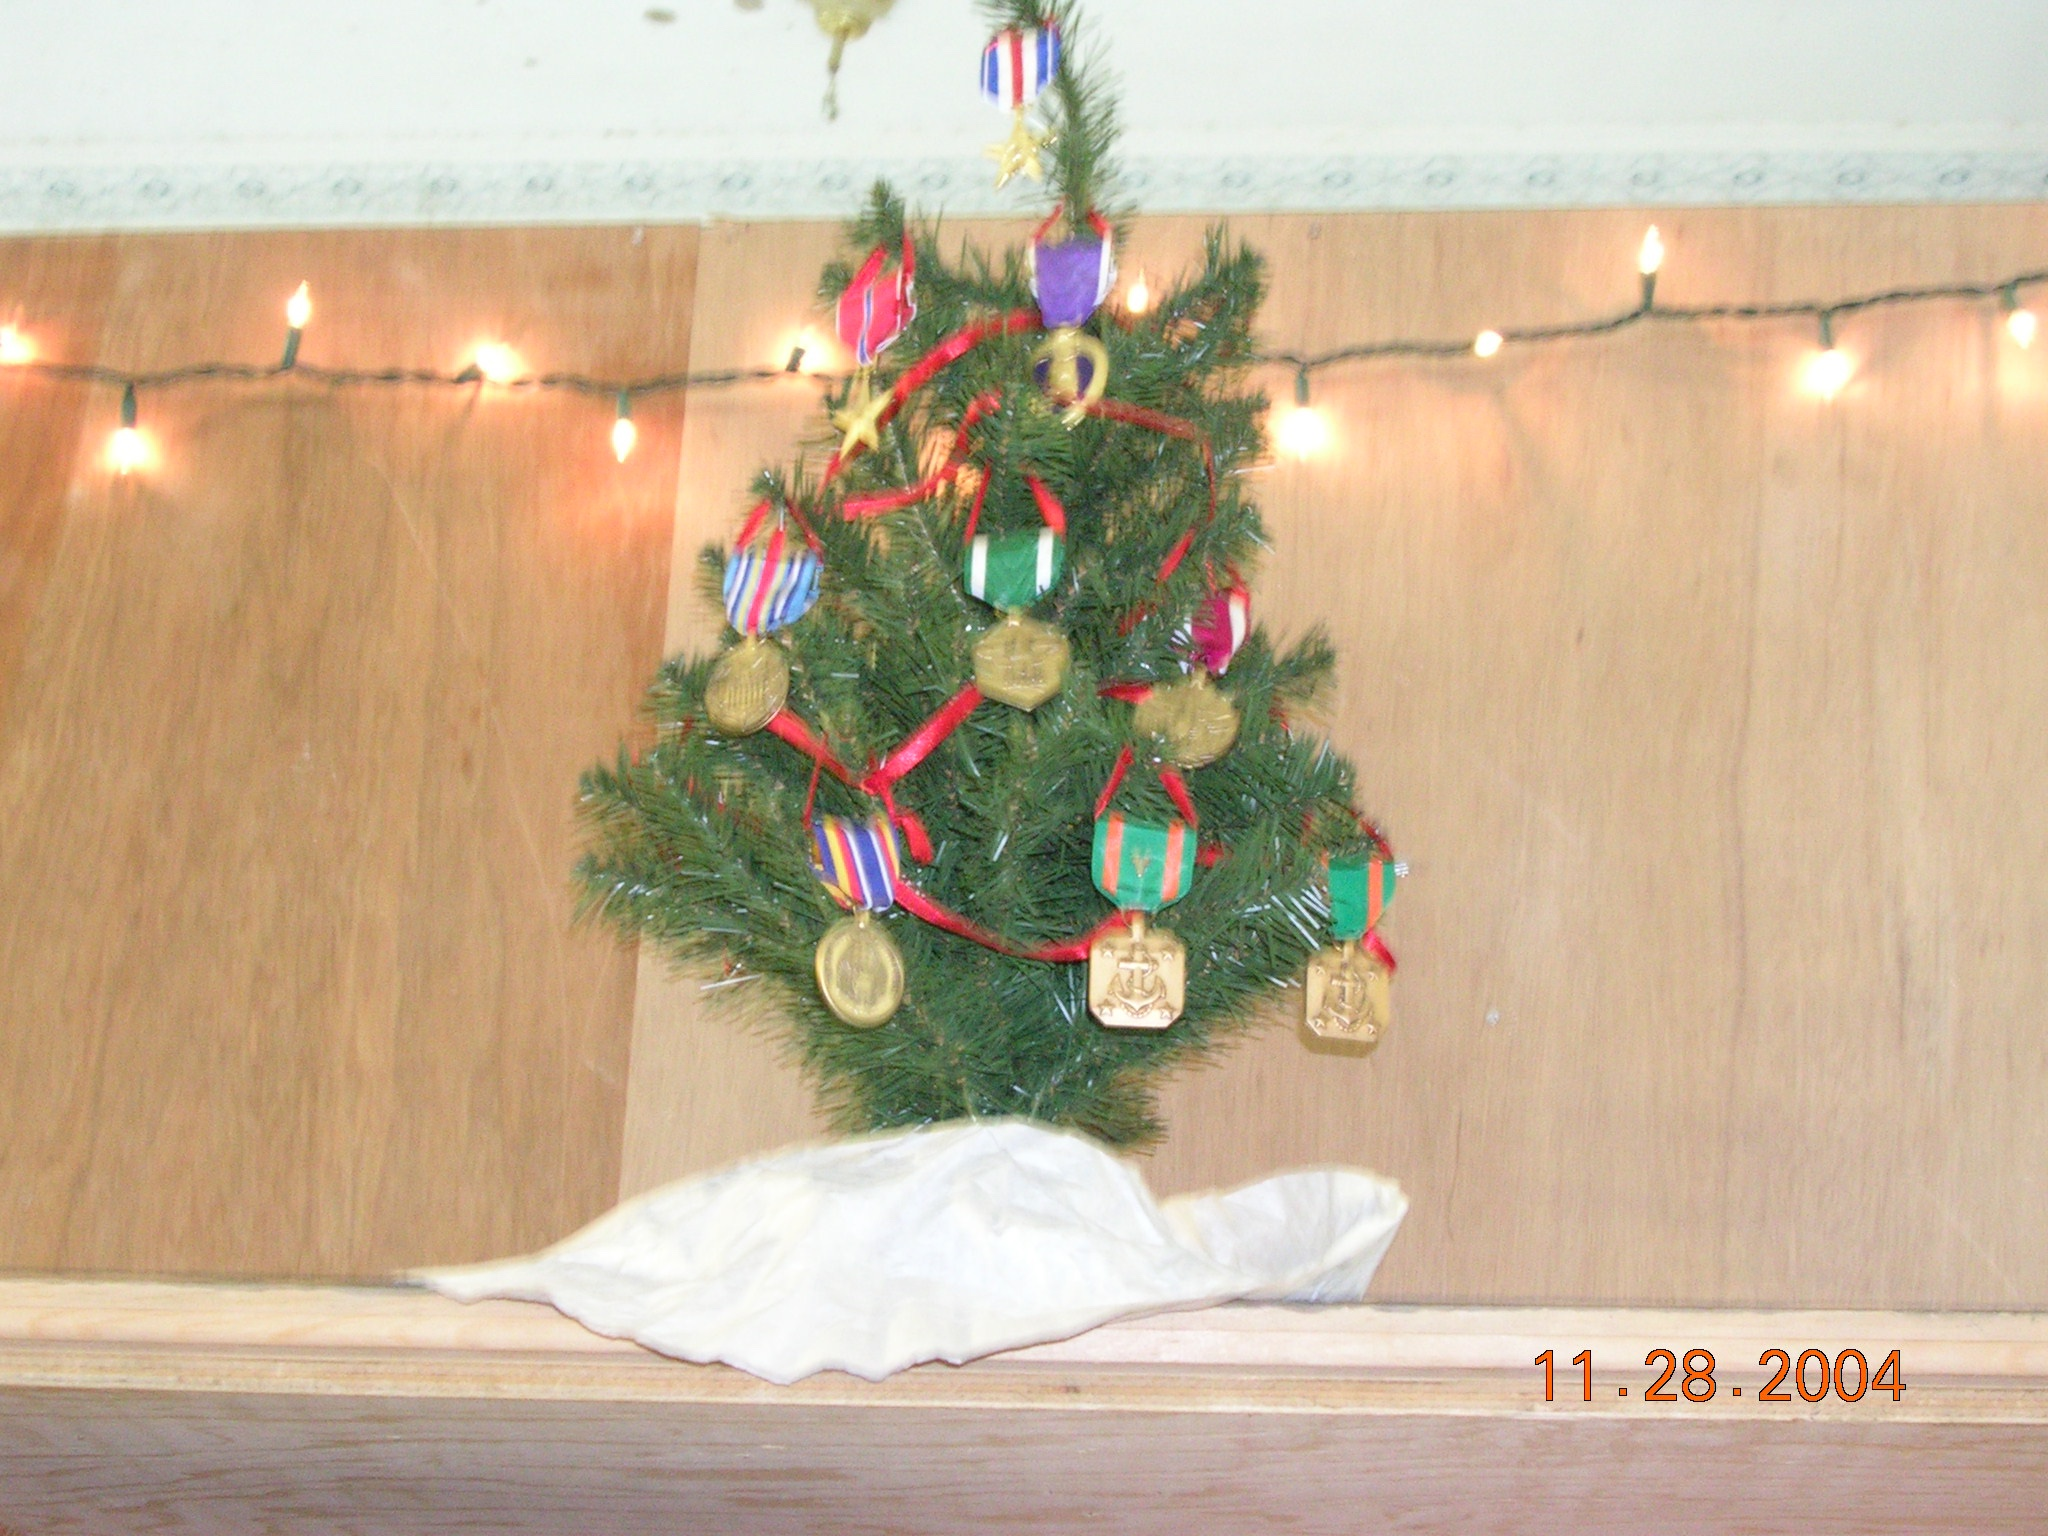 Christmas in Iraq